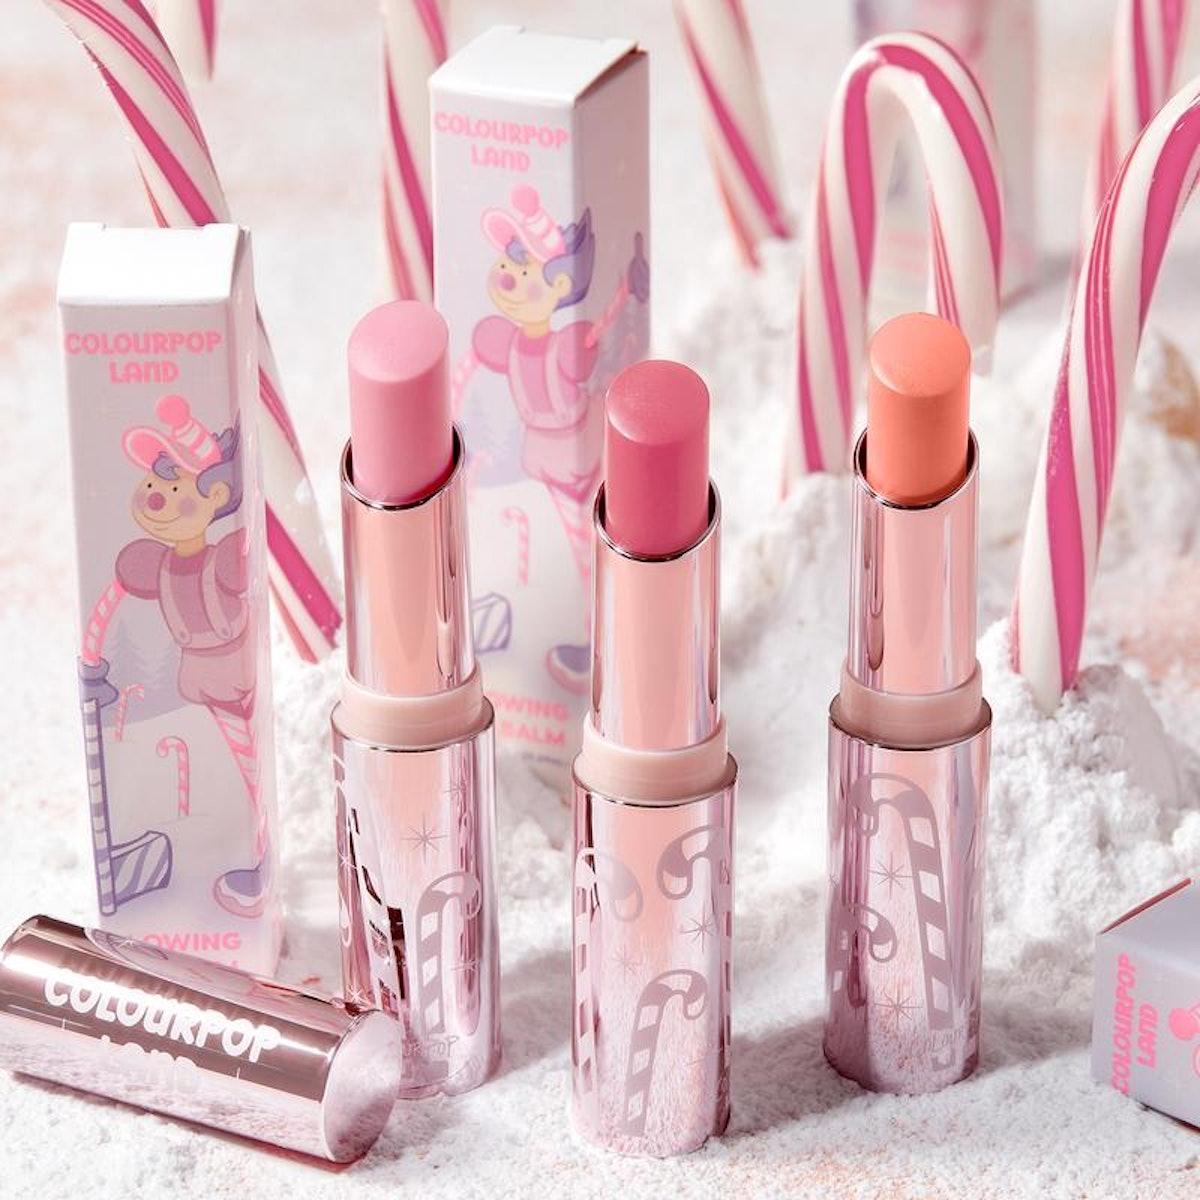 ColourPop x Candy Land Sweet Escape Glowing Lip Balm Set